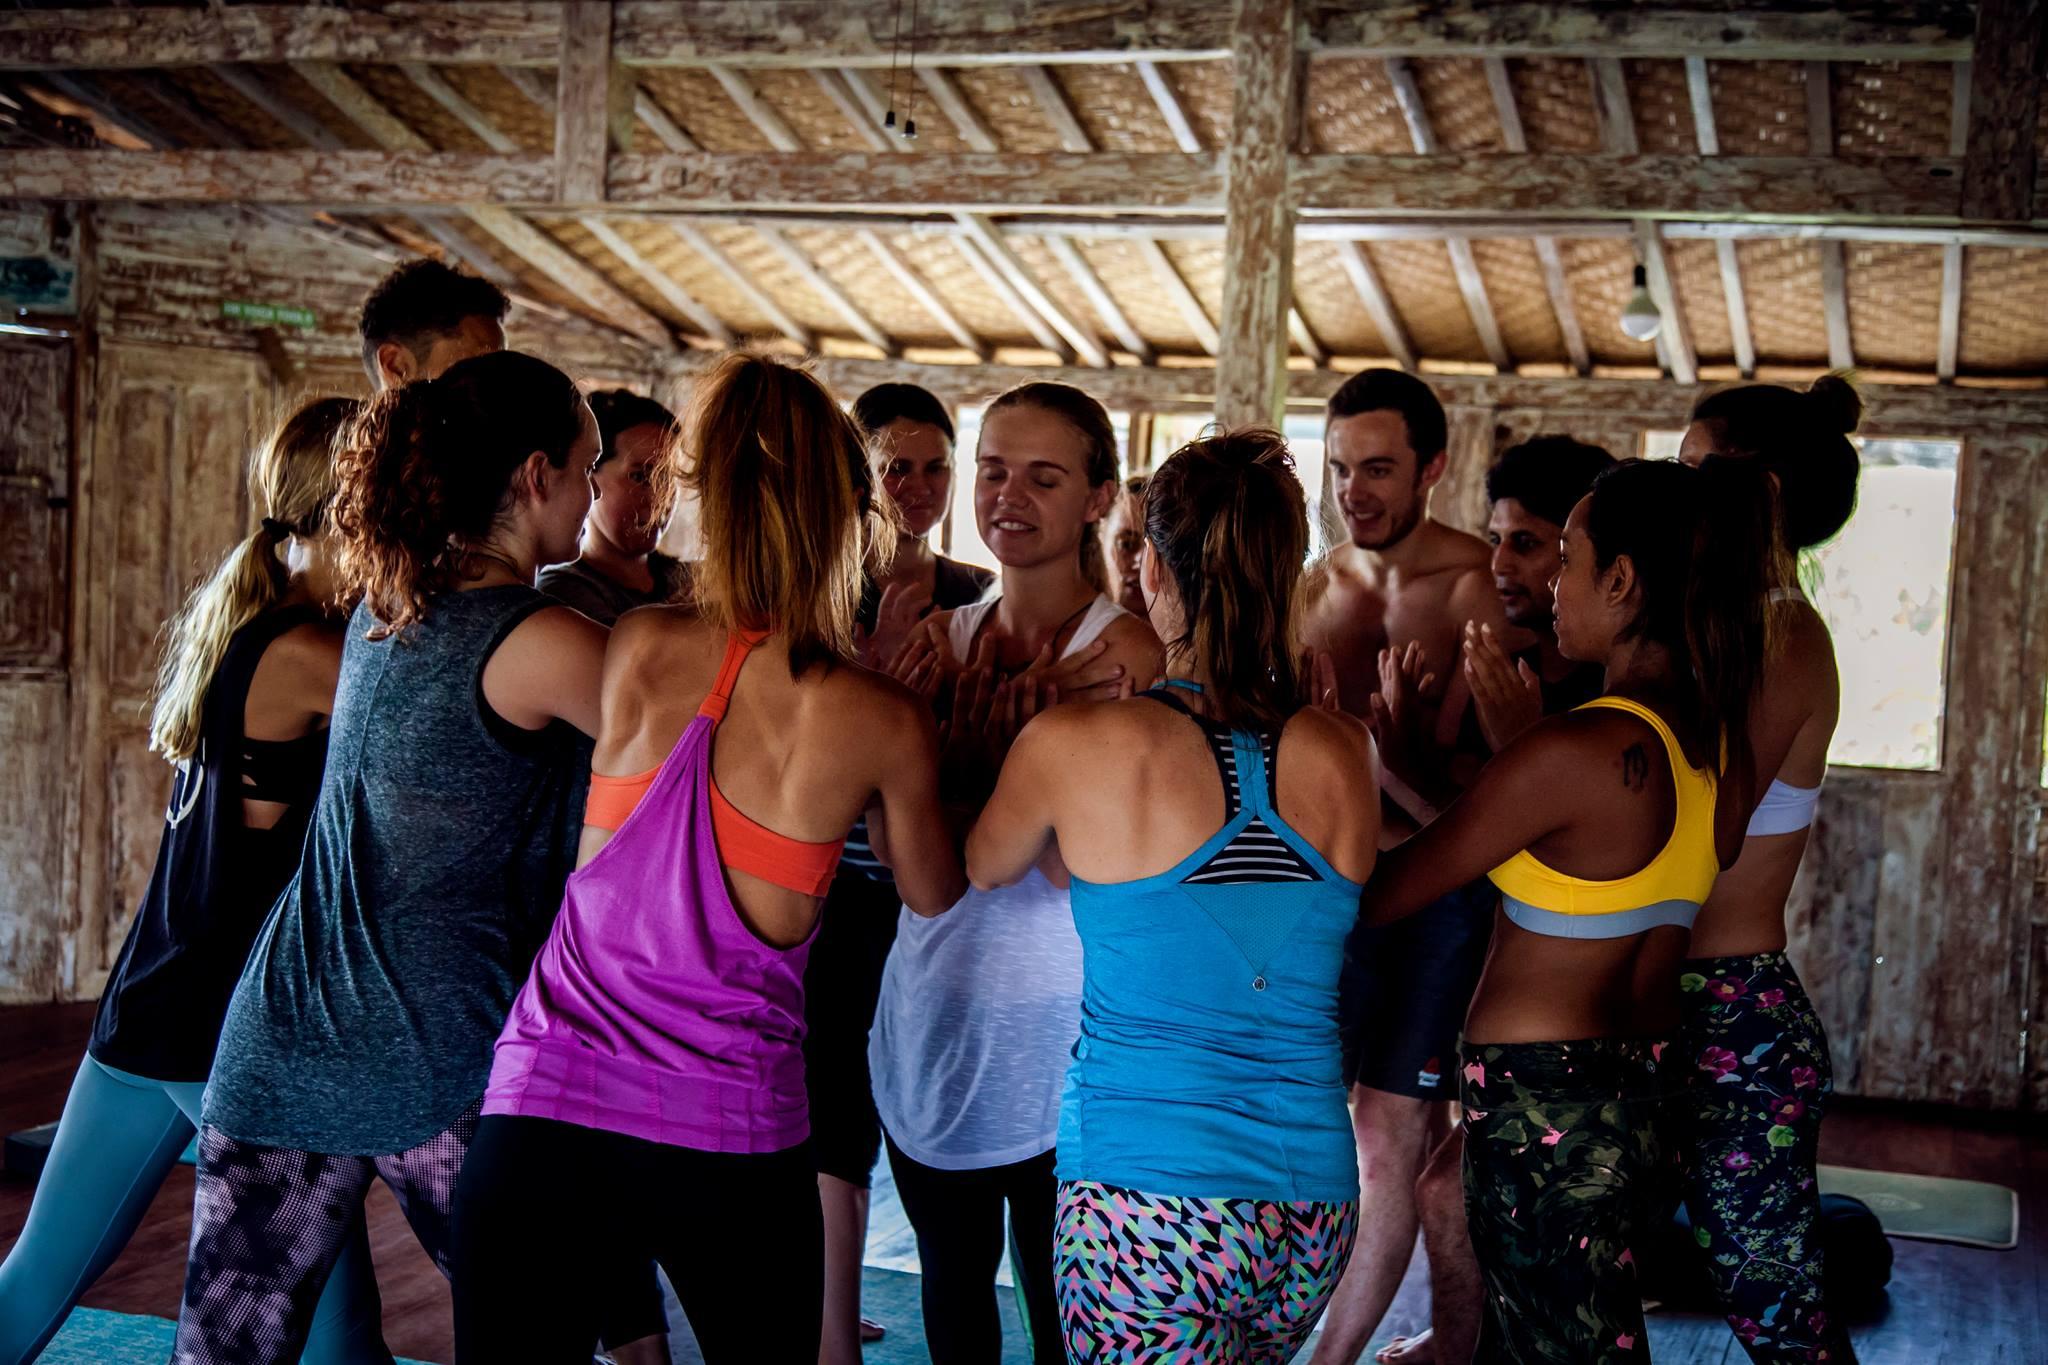 compte rendu de ma formation de 200hrs de yoga a bali 5